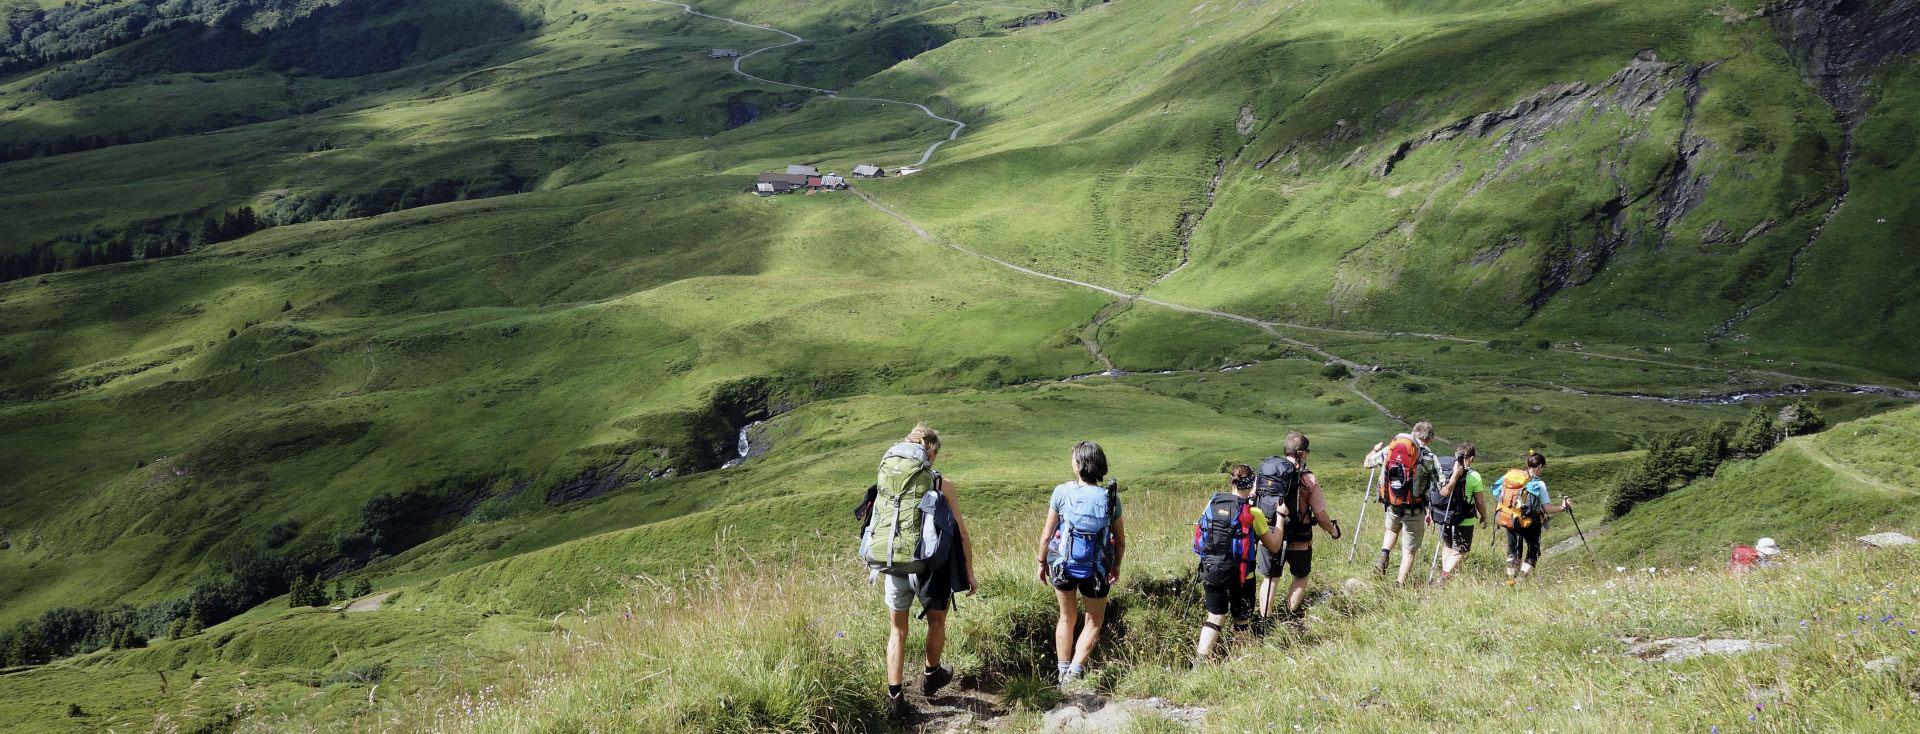 Mountain-day-trips-from-Munich-berg